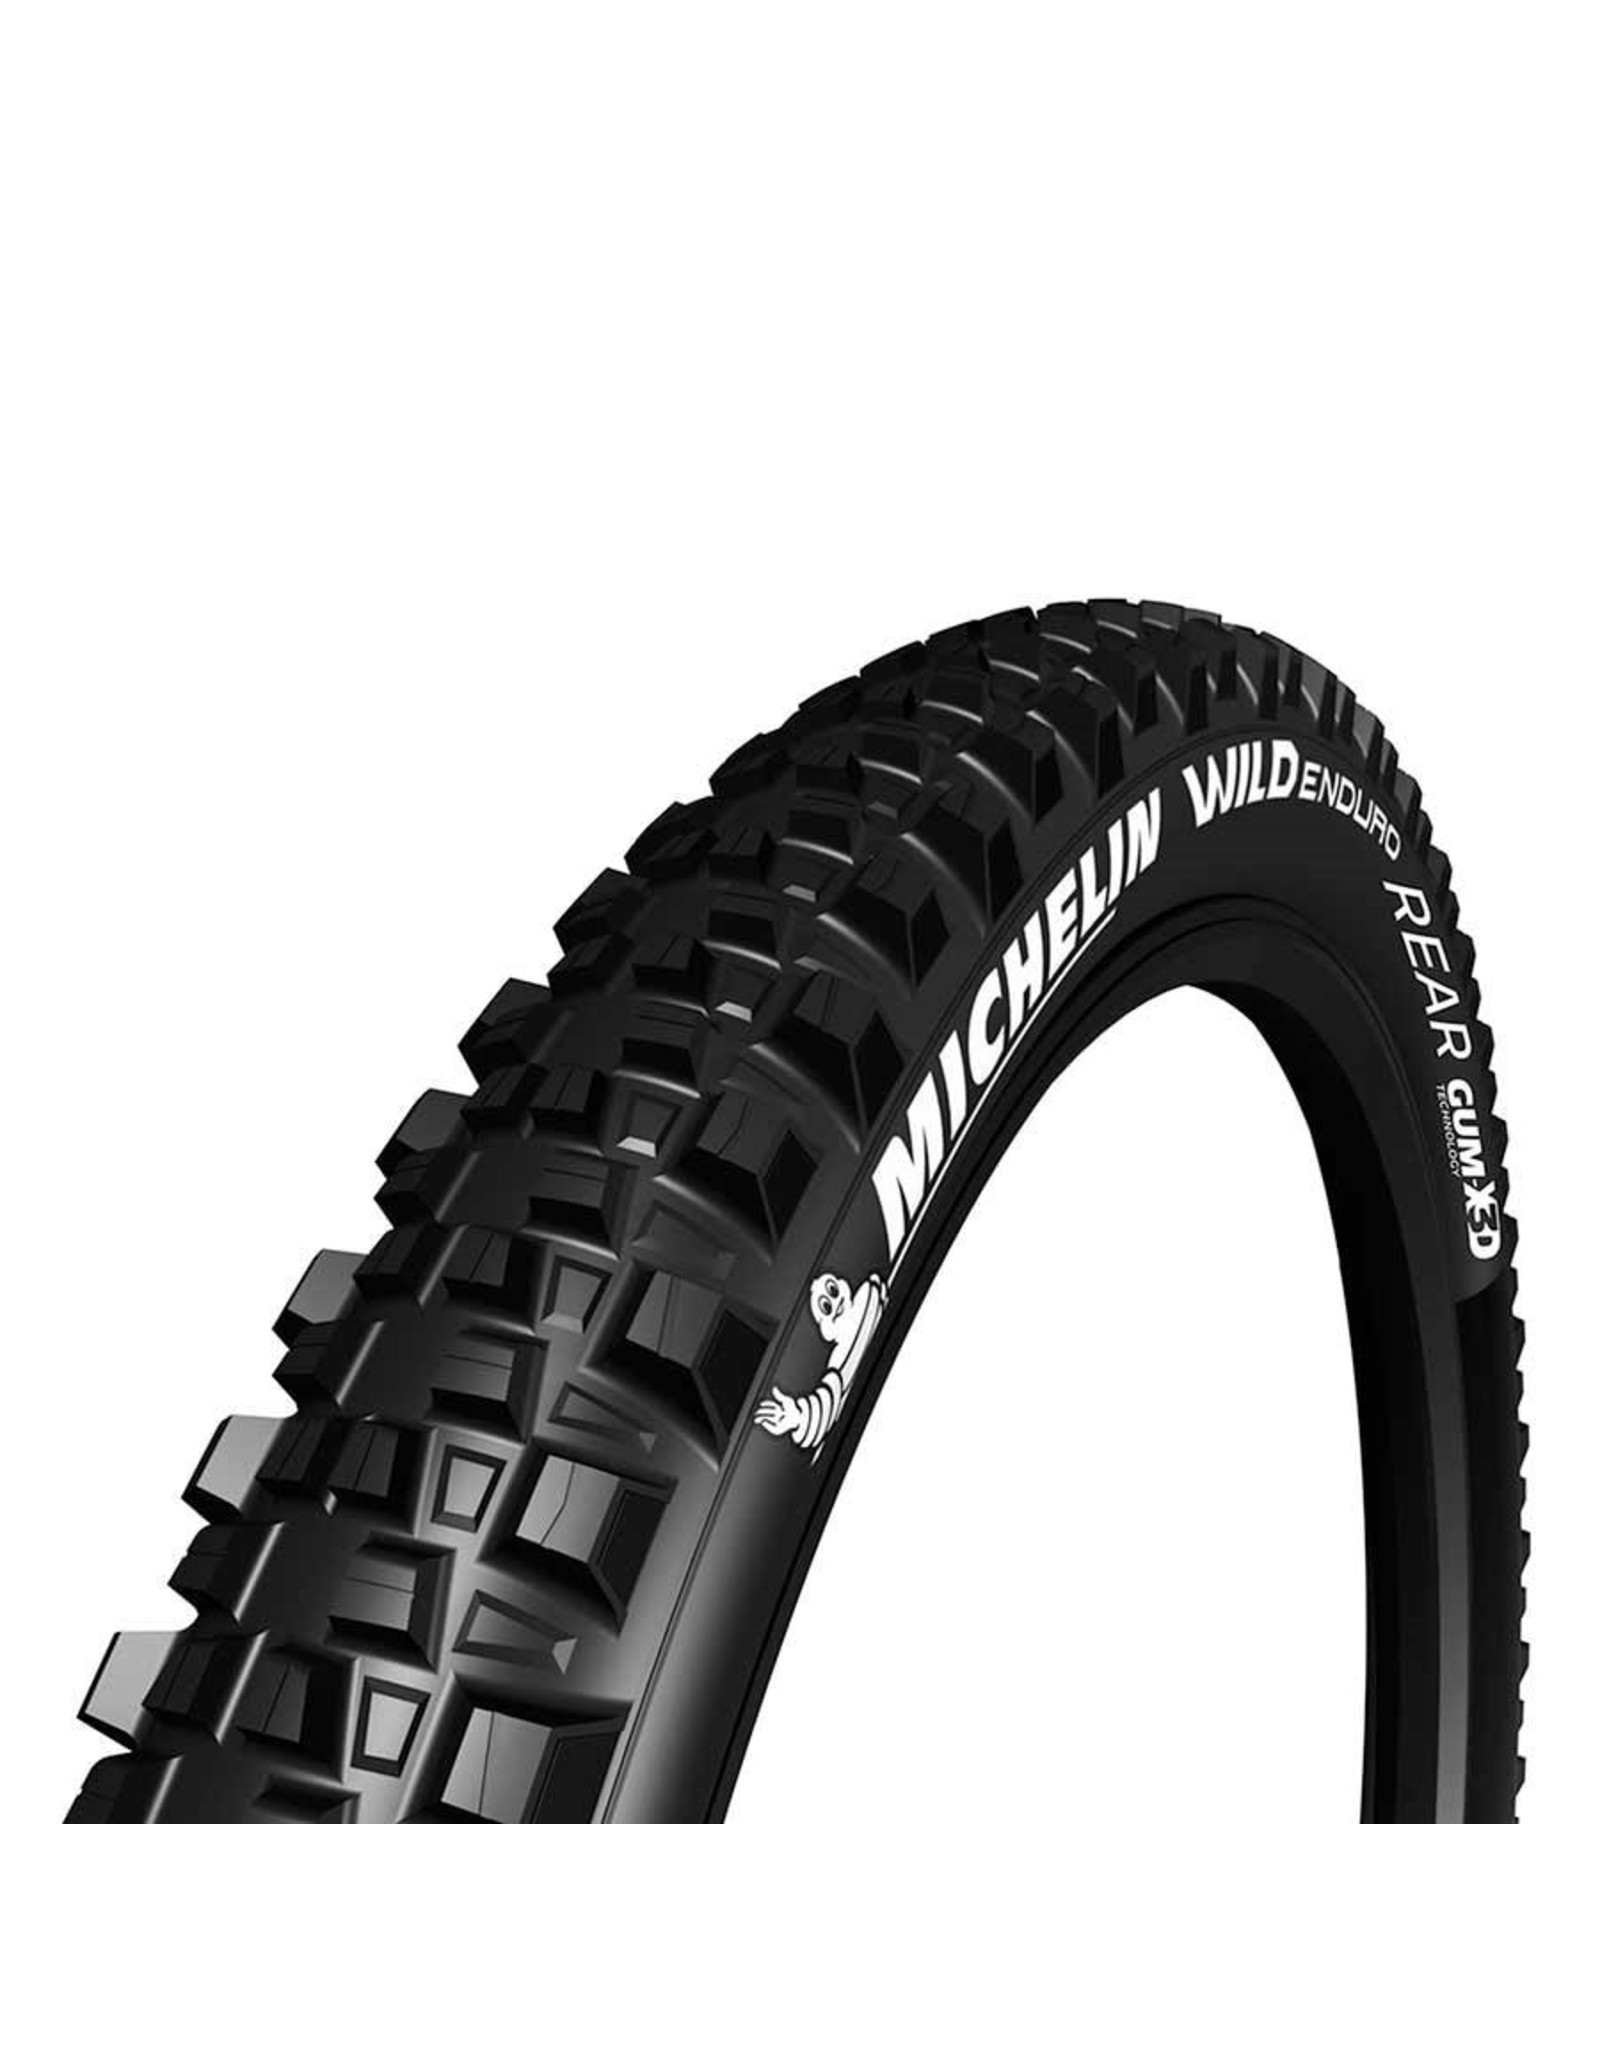 Michelin Wild Enduro Rear, Tire, 27.5''x2.40, Folding, Tubeless Ready, GUM-X, GravityShield, 60TPI, Black